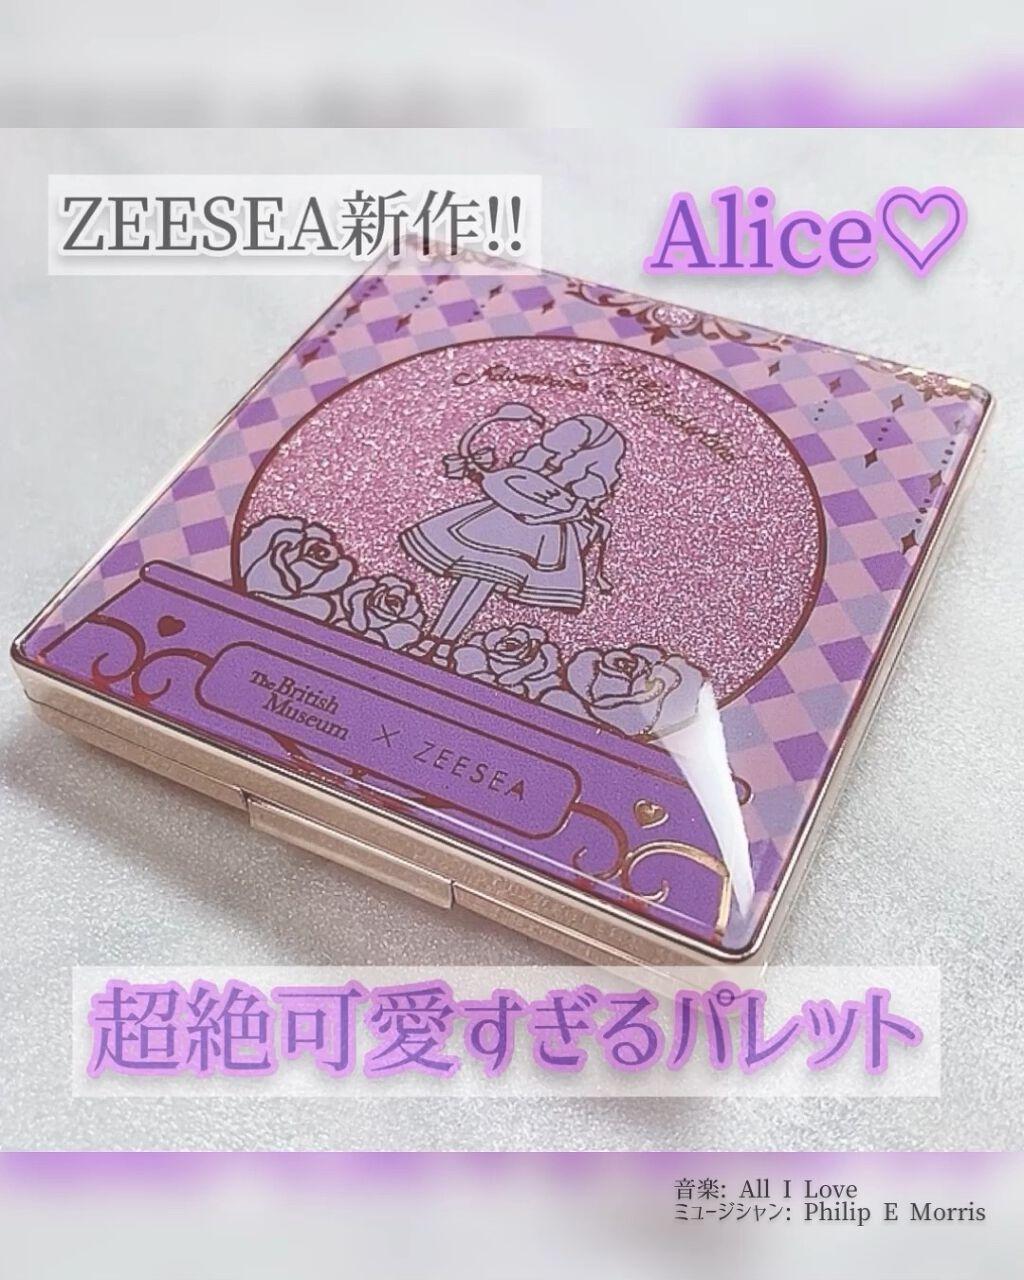 ZEESEA×大英博物館 アリスドリームランドシリーズ アイシャドウパレット(4色)/ZEESEA/パウダーアイシャドウを使ったクチコミ(1枚目)